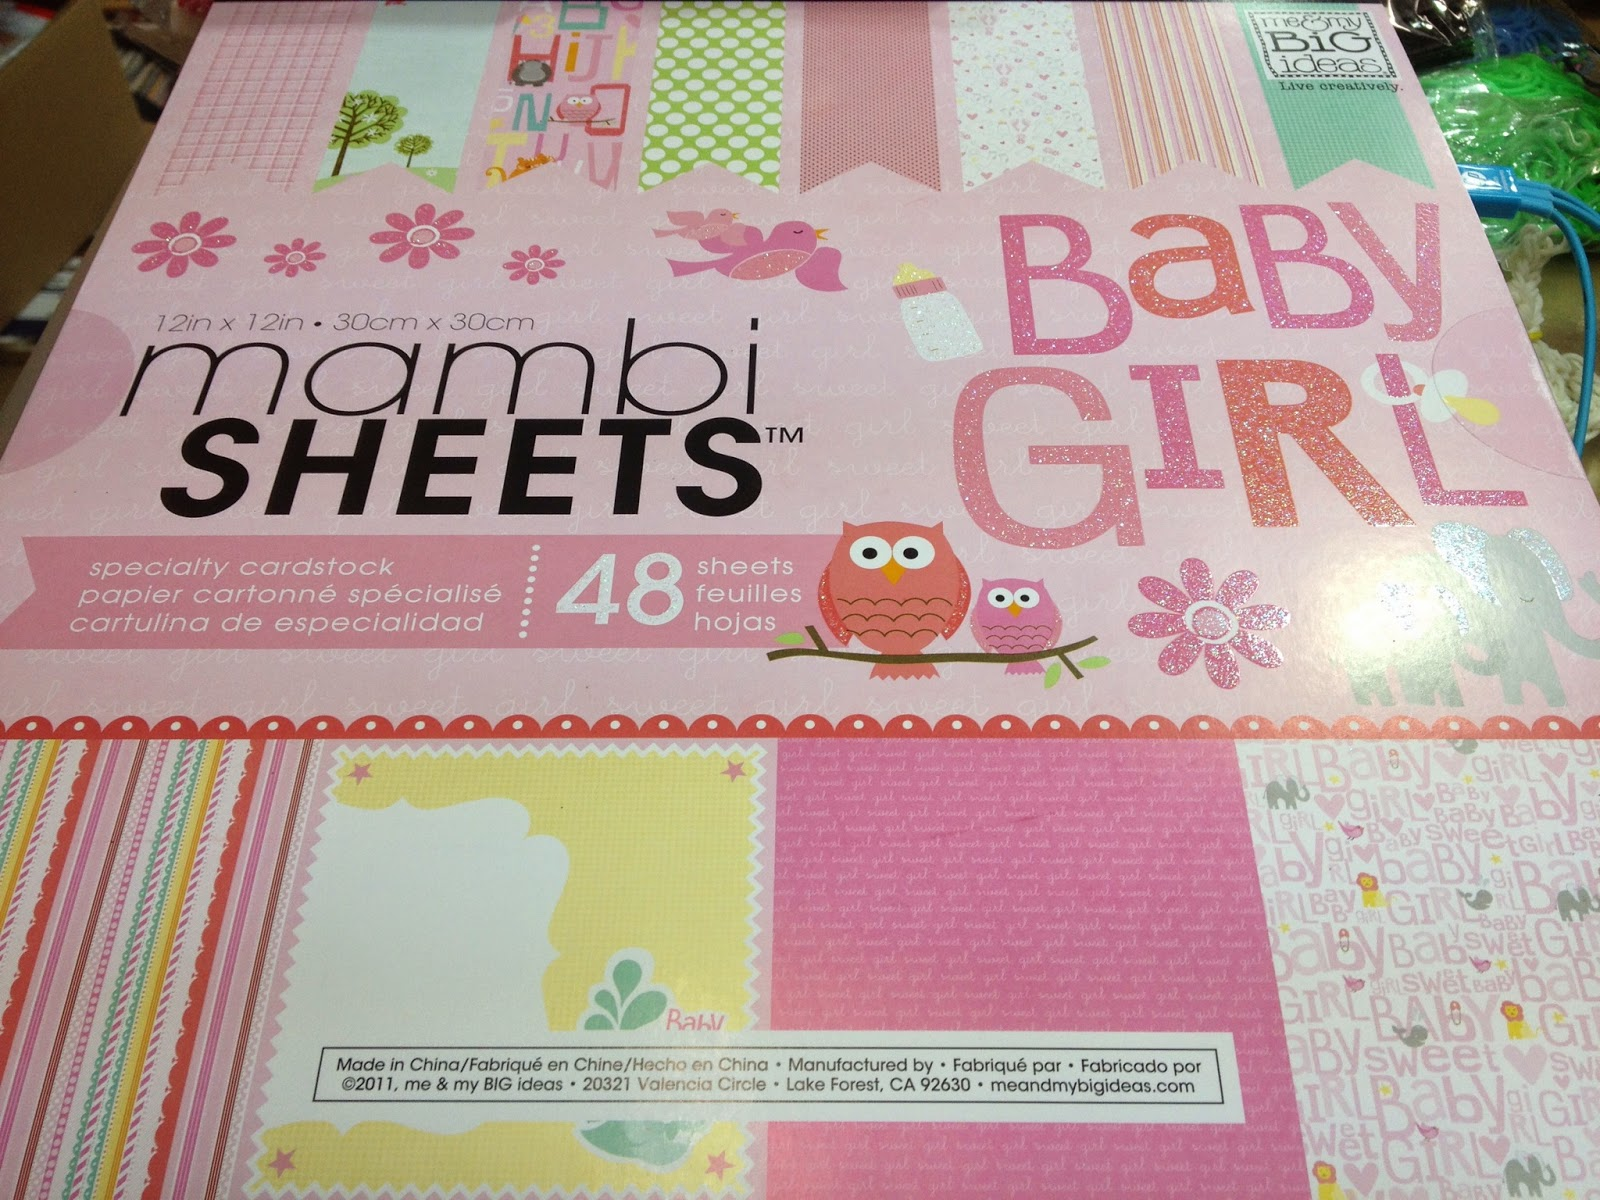 Scrapbook Memories Me My Big Ideas 12x12 Mambi Sheets Paper Pad